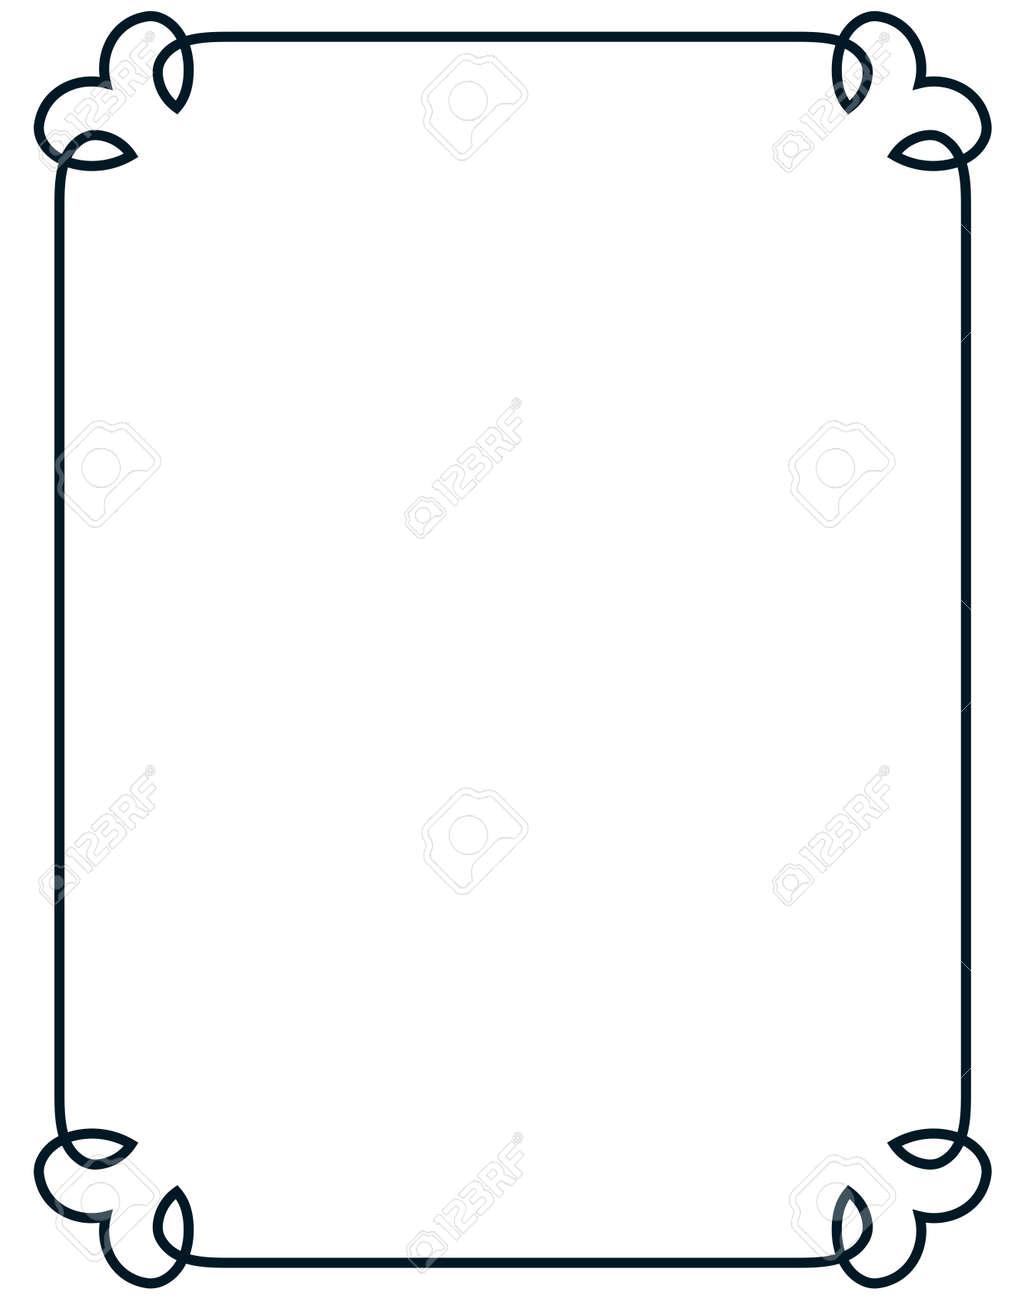 border frame line deco vector label simple royalty free cliparts rh 123rf com art deco vectors free download art deco vector art free